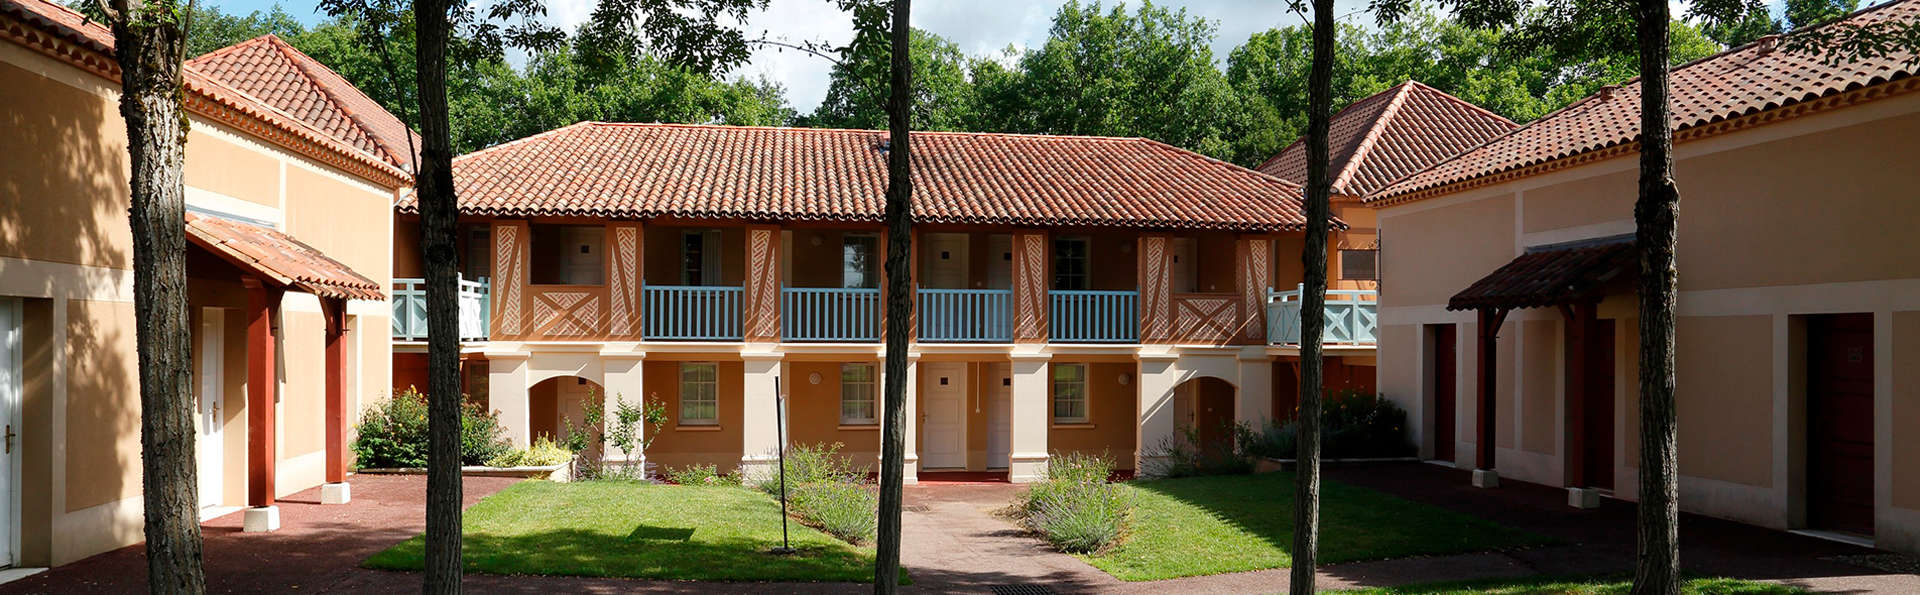 Residence Lac Mondésir de Montflanquin - edit_patio.jpg